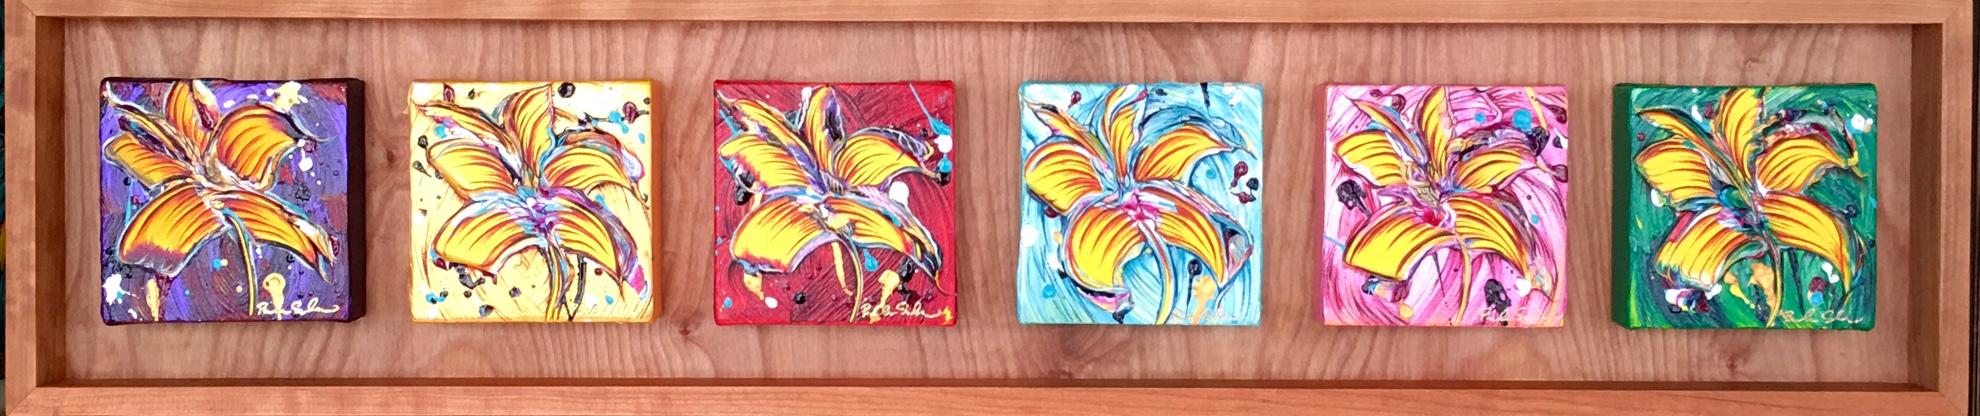 Shades of Aloha Framed Set